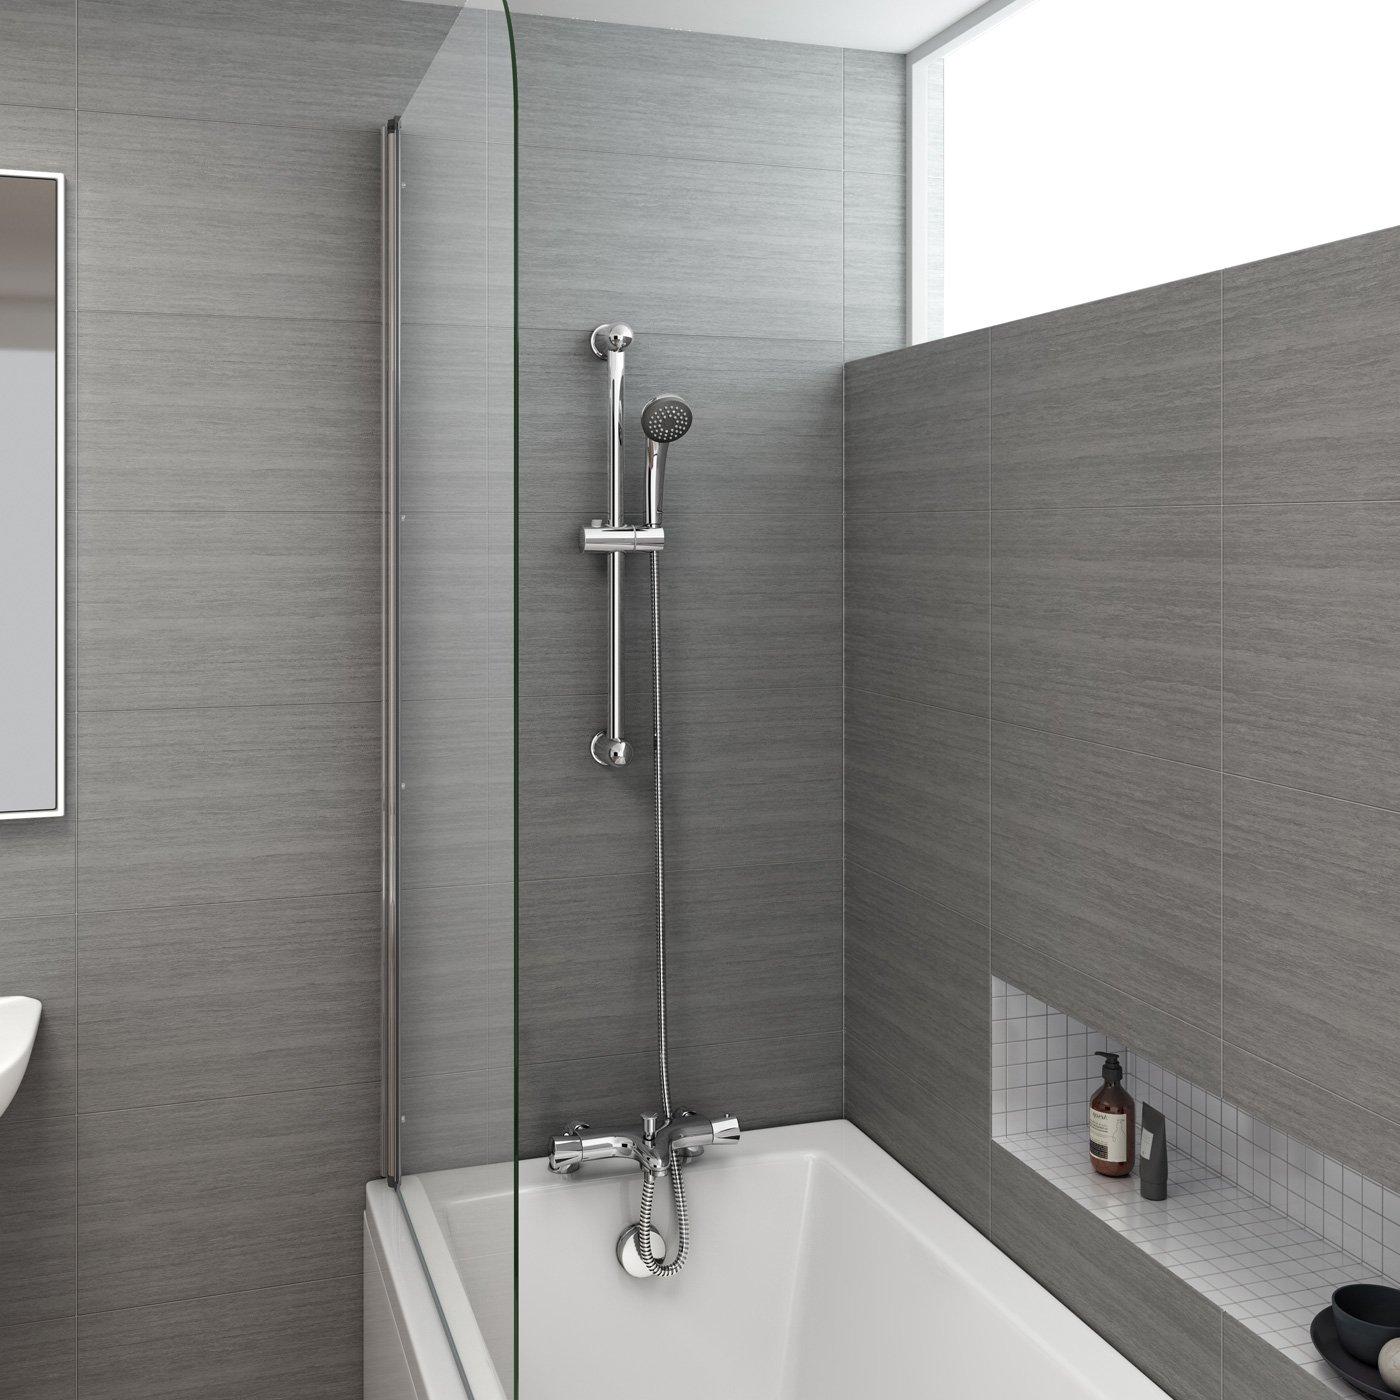 Chrome Thermostatic Shower Mixer Valve Bath Deck Tap Riser Rail + ...